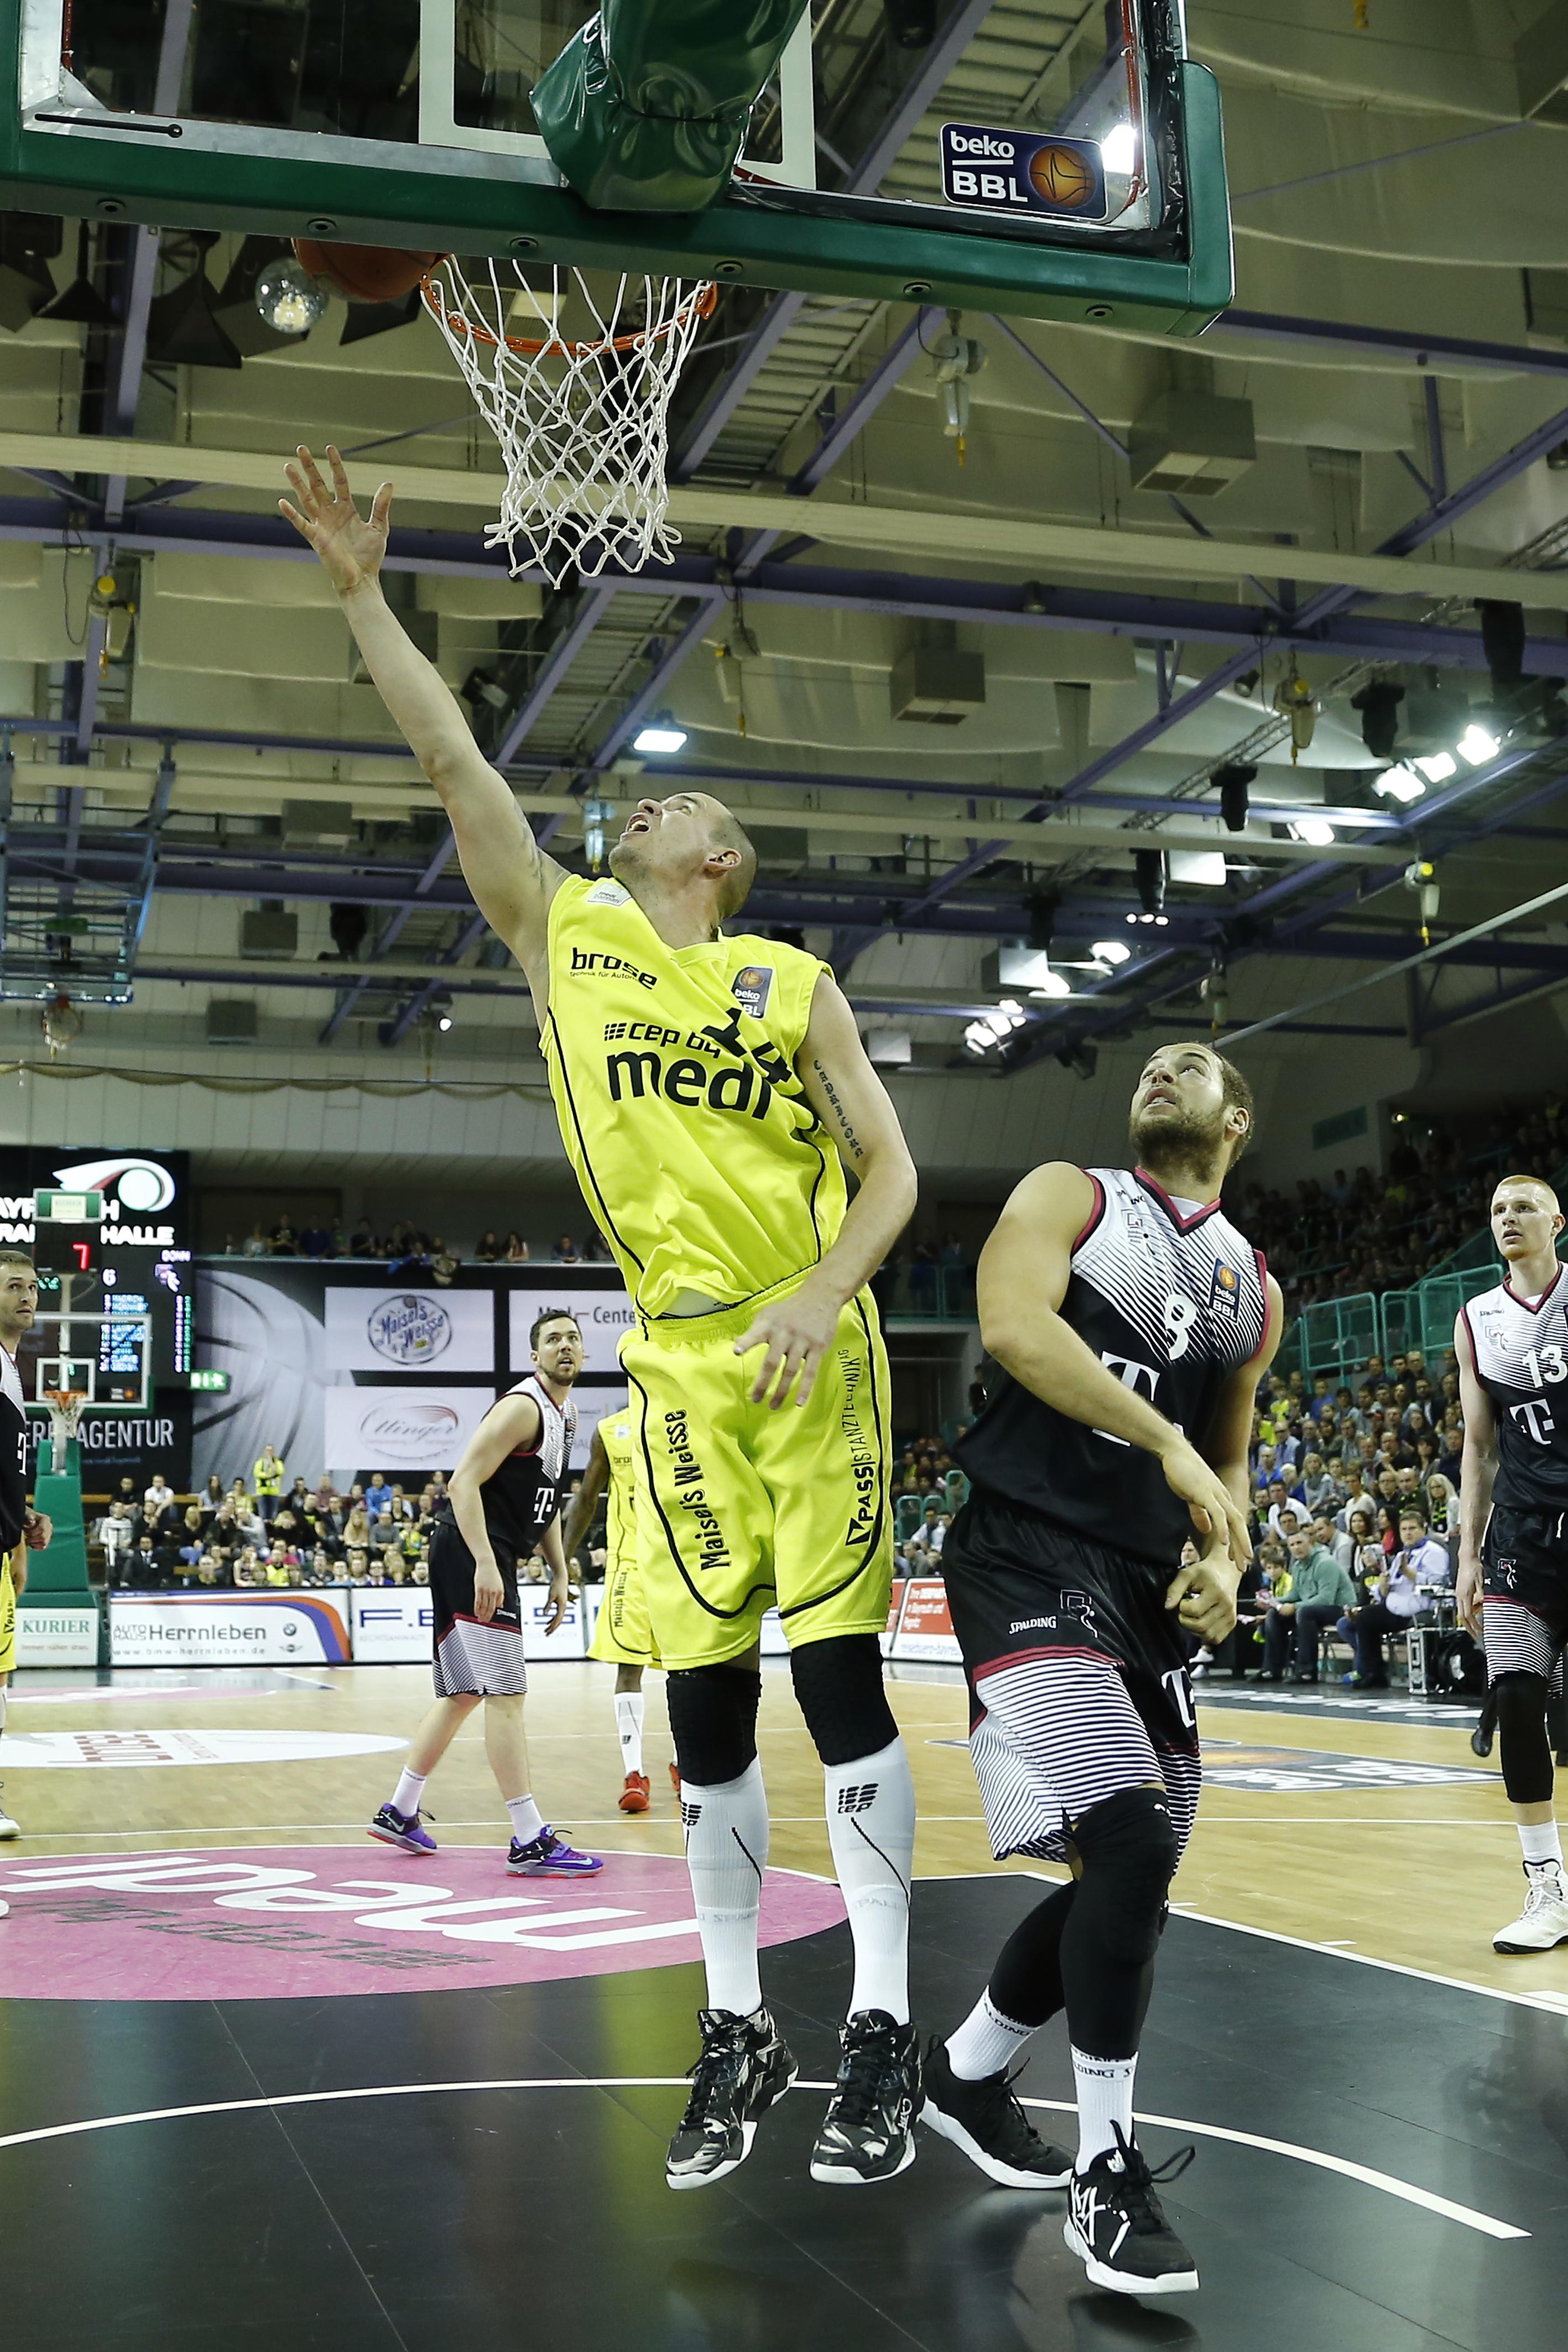 Fotos vom Bachelor: Als Basketballer gegen medi | Bayreuther Tagblatt